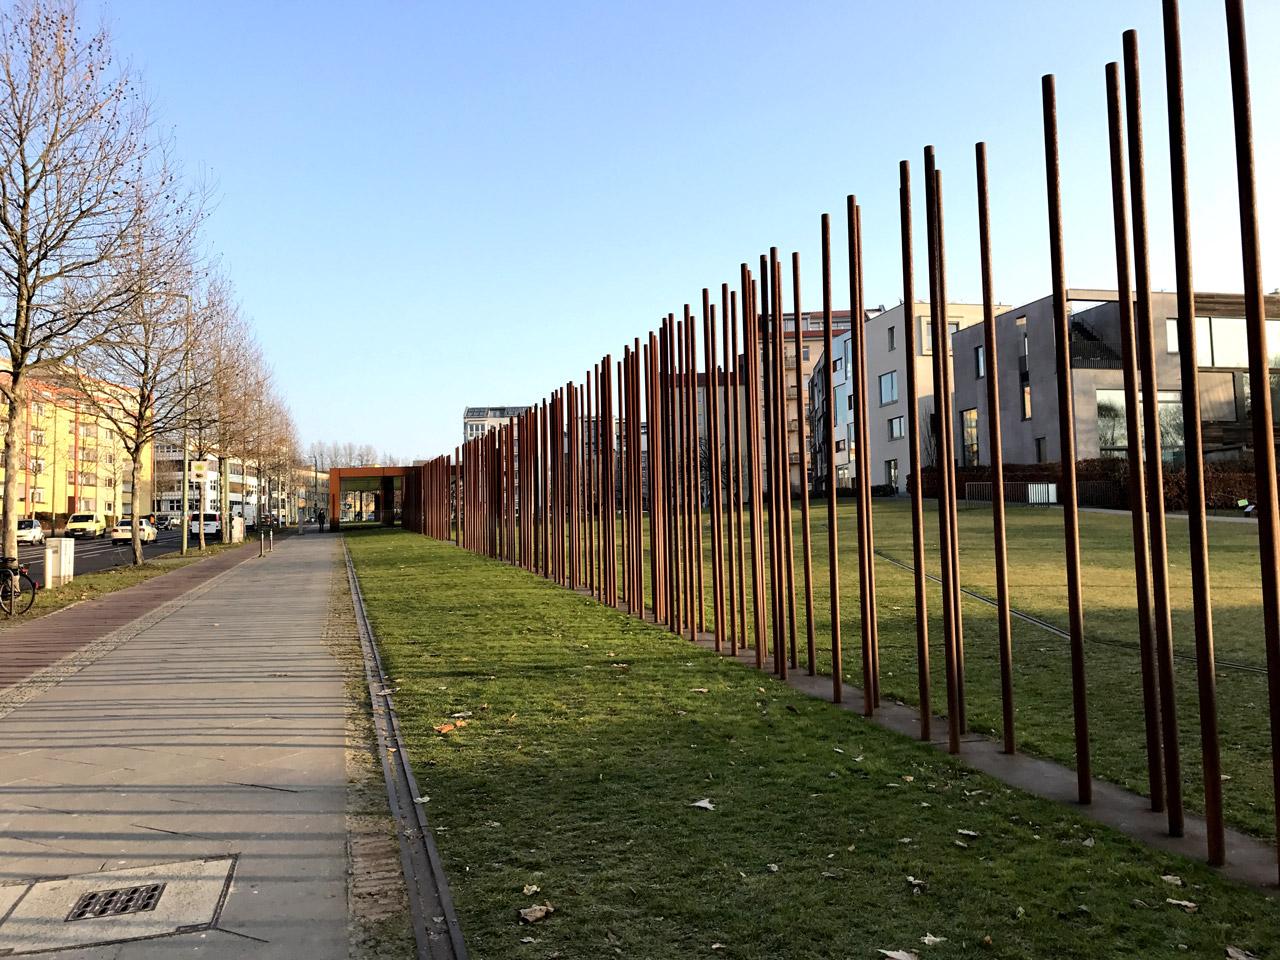 le mémorial de berlin